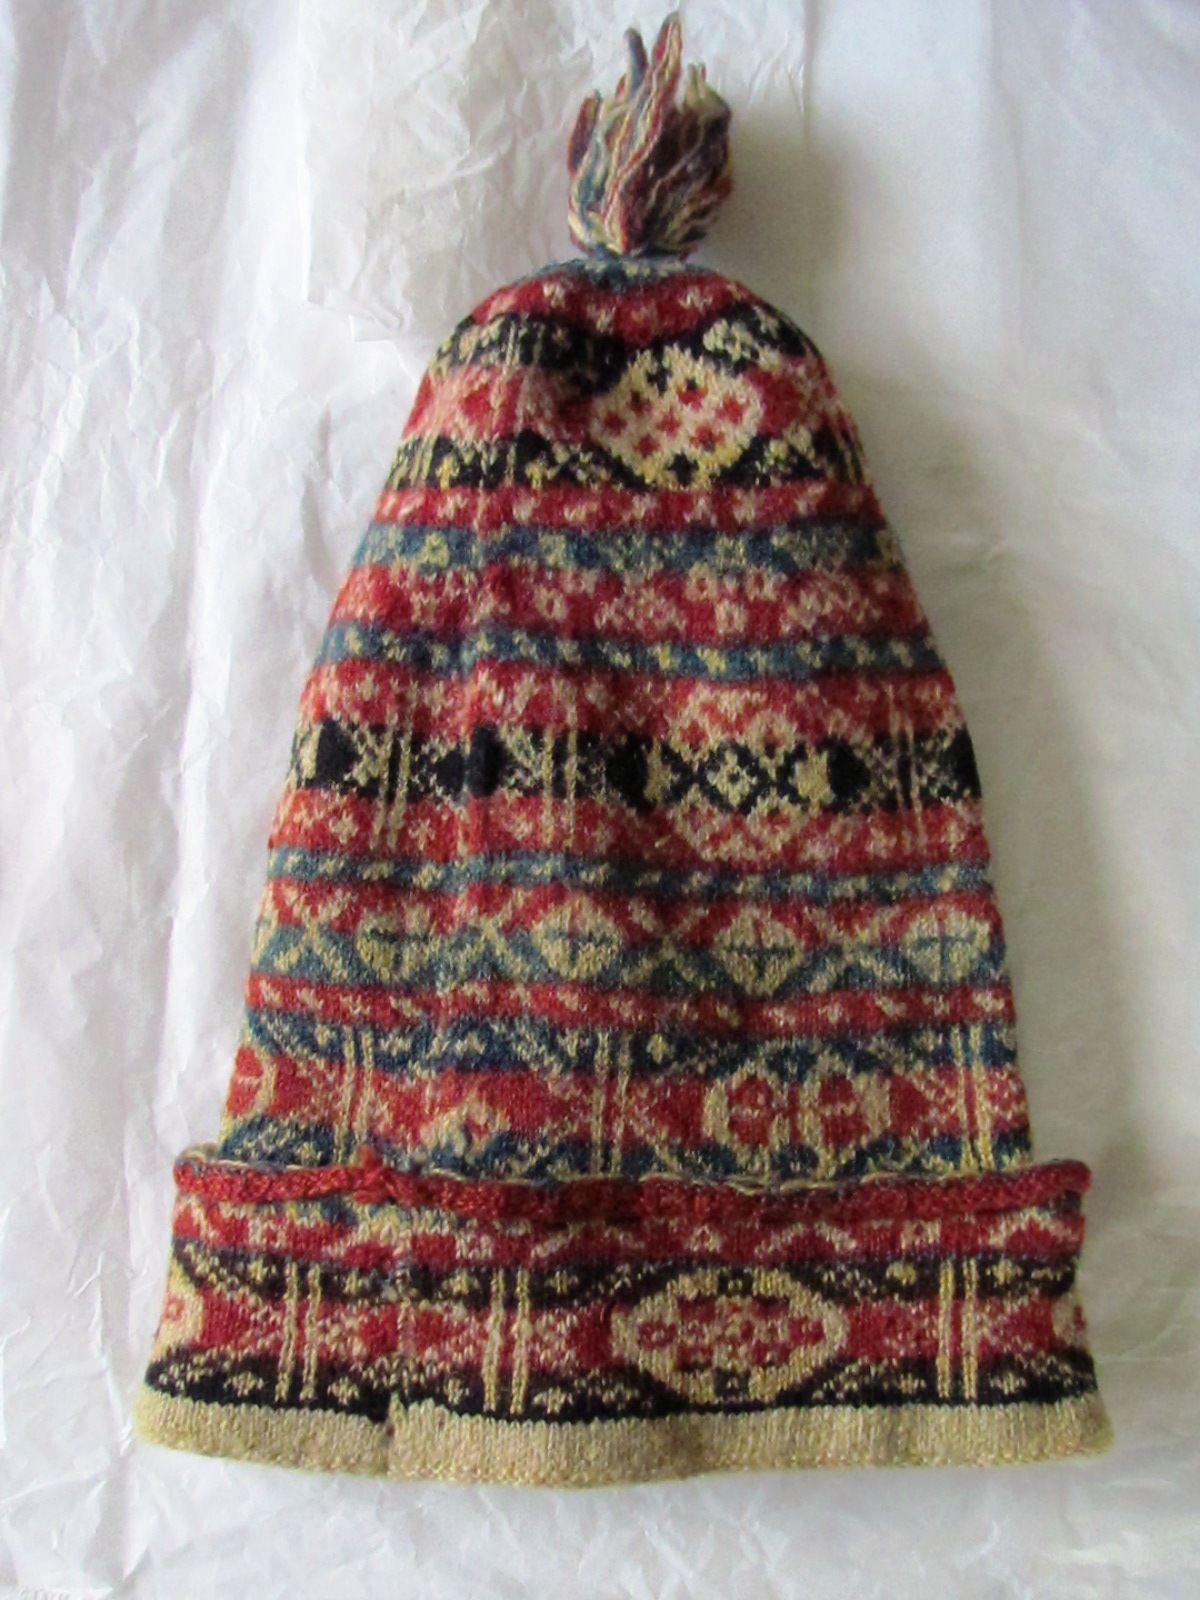 Original Fair Isle Cap | Fair isles, Fair isle knitting and Crochet